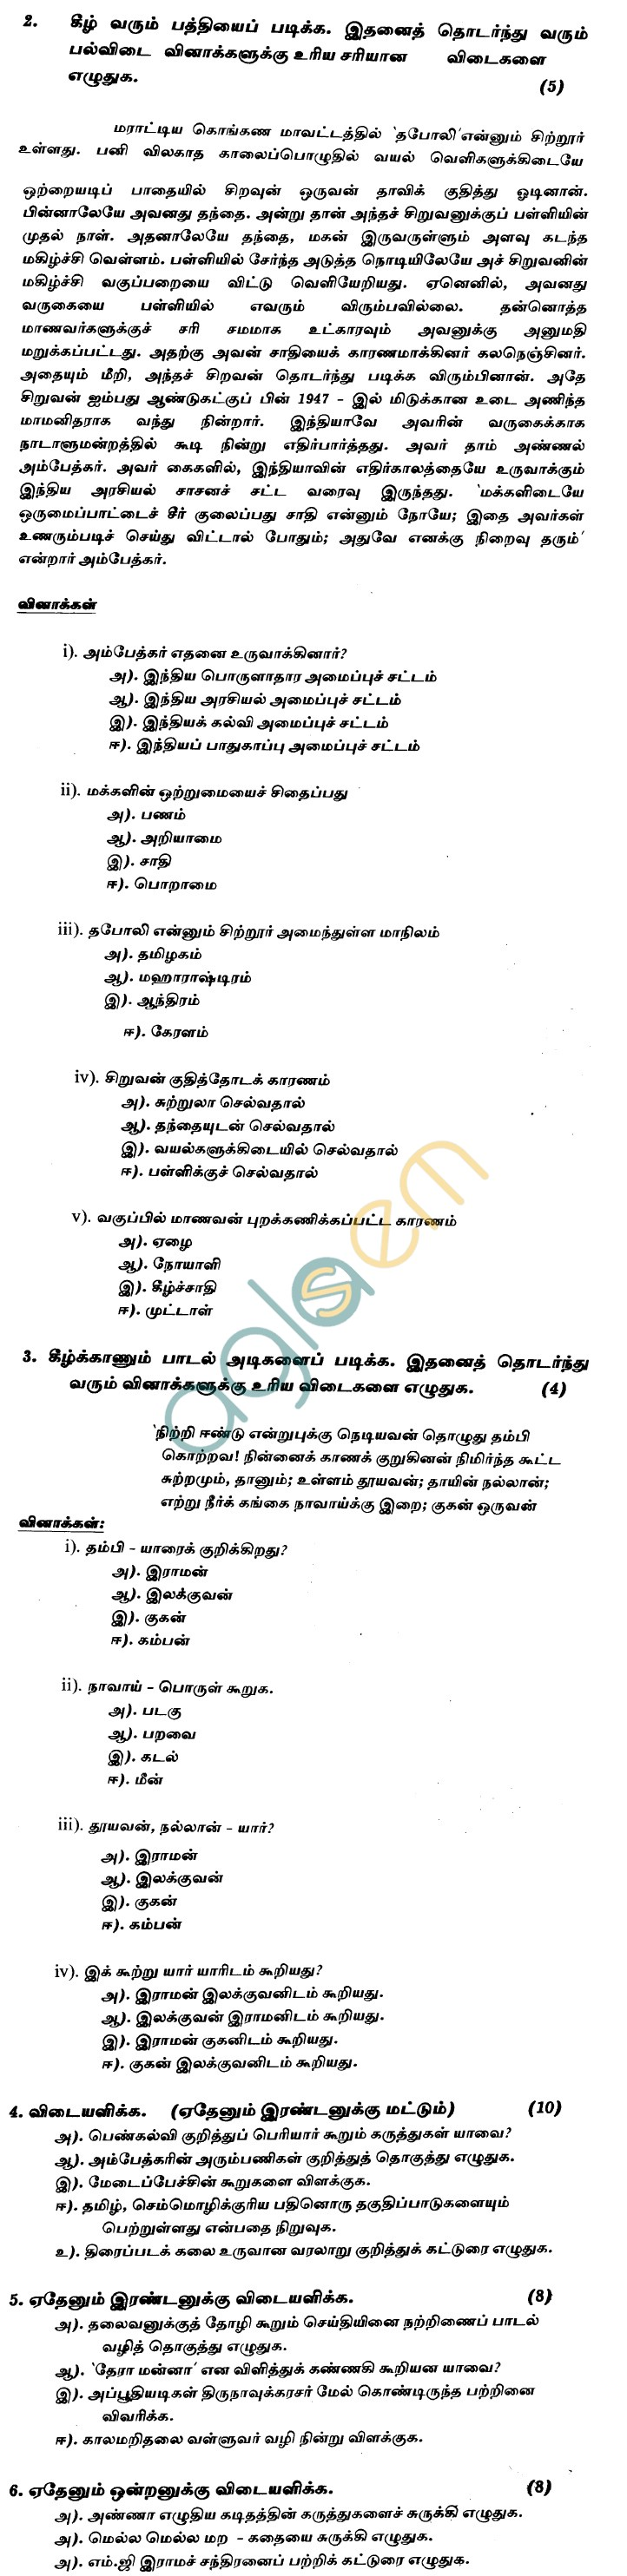 CBSE Board Exam Sample Papers (SA1): Class X – Tamil | AglaSem Schools